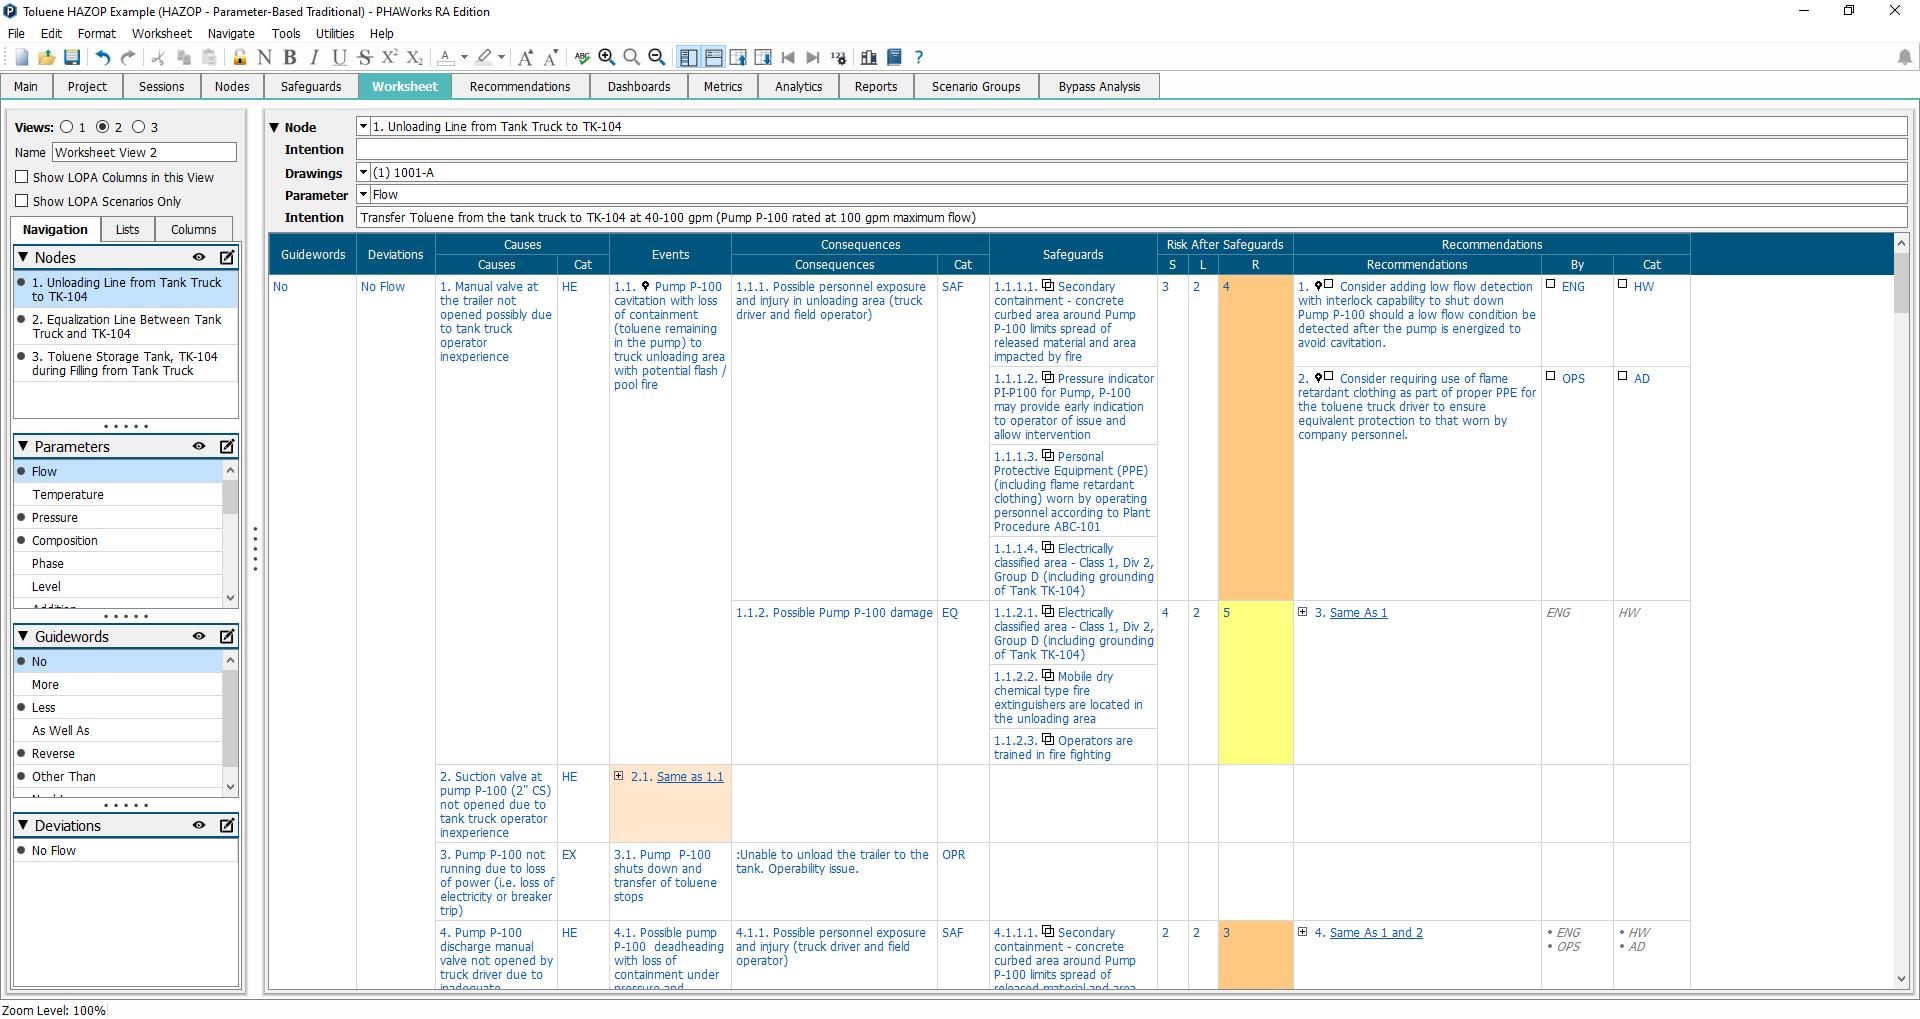 PHAWorks managing worksheets